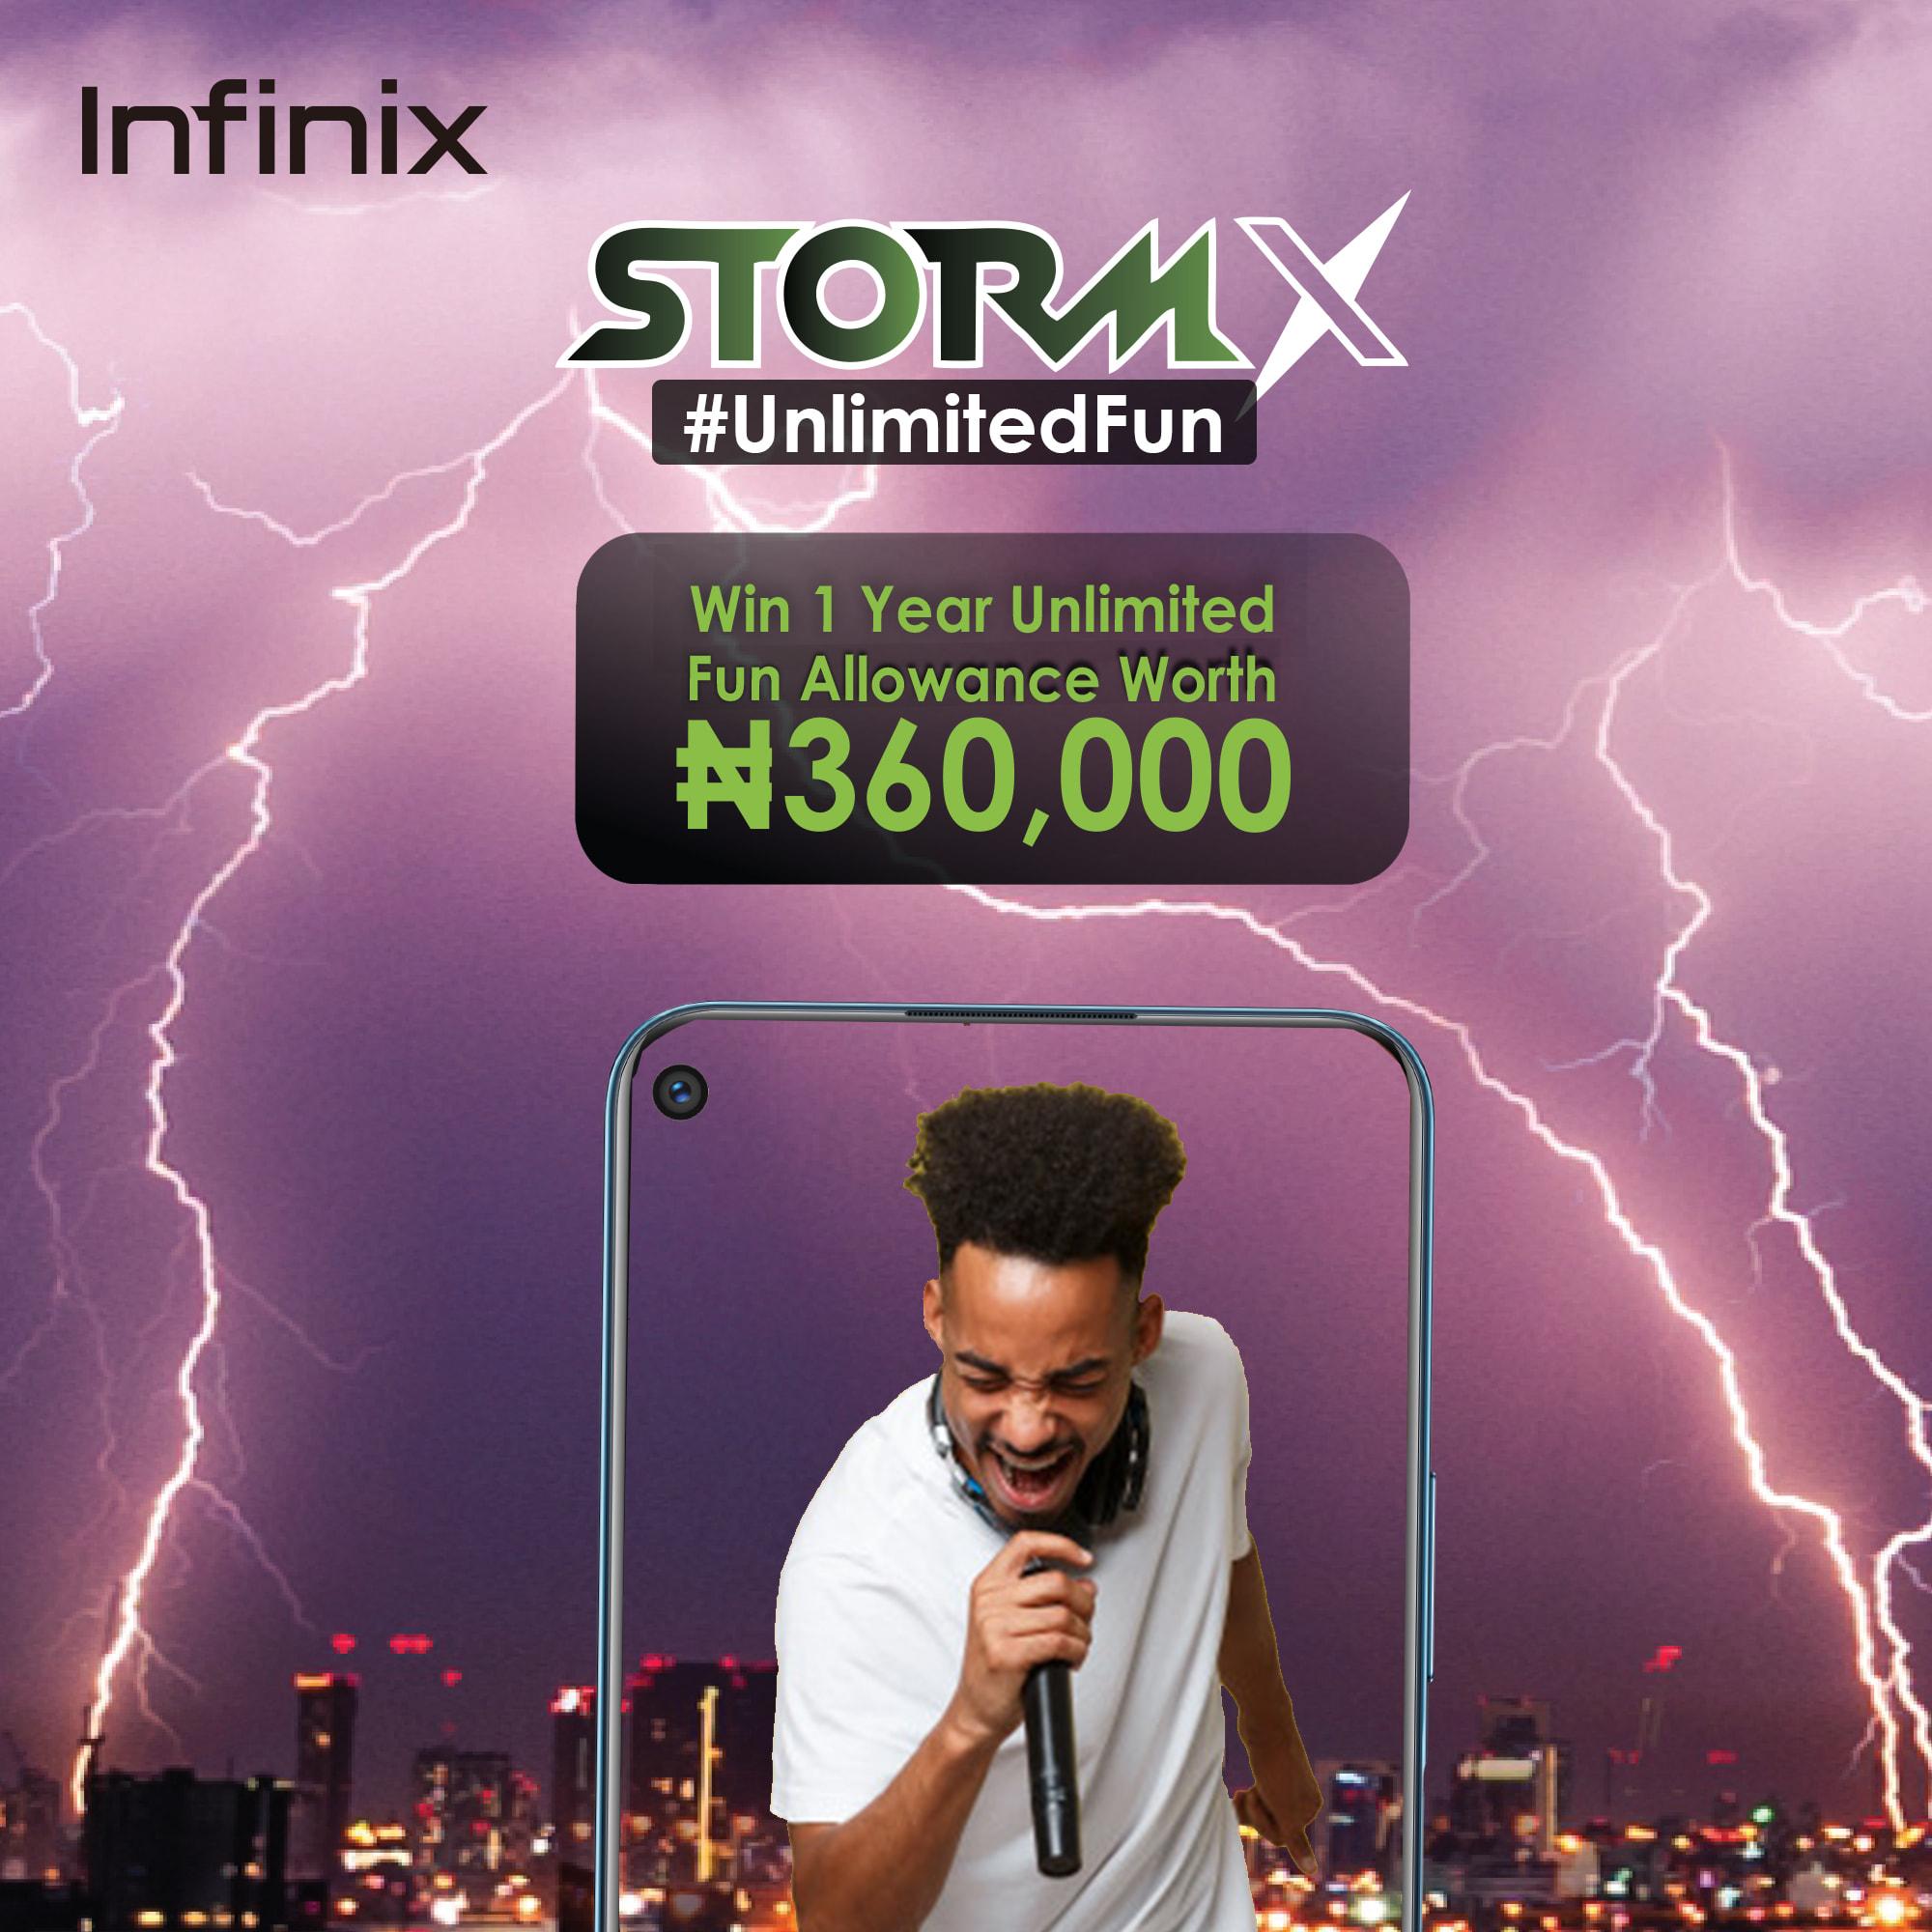 Win 1 Year N360k Fun Allowance in Infinix StormX #UnlimitedFun